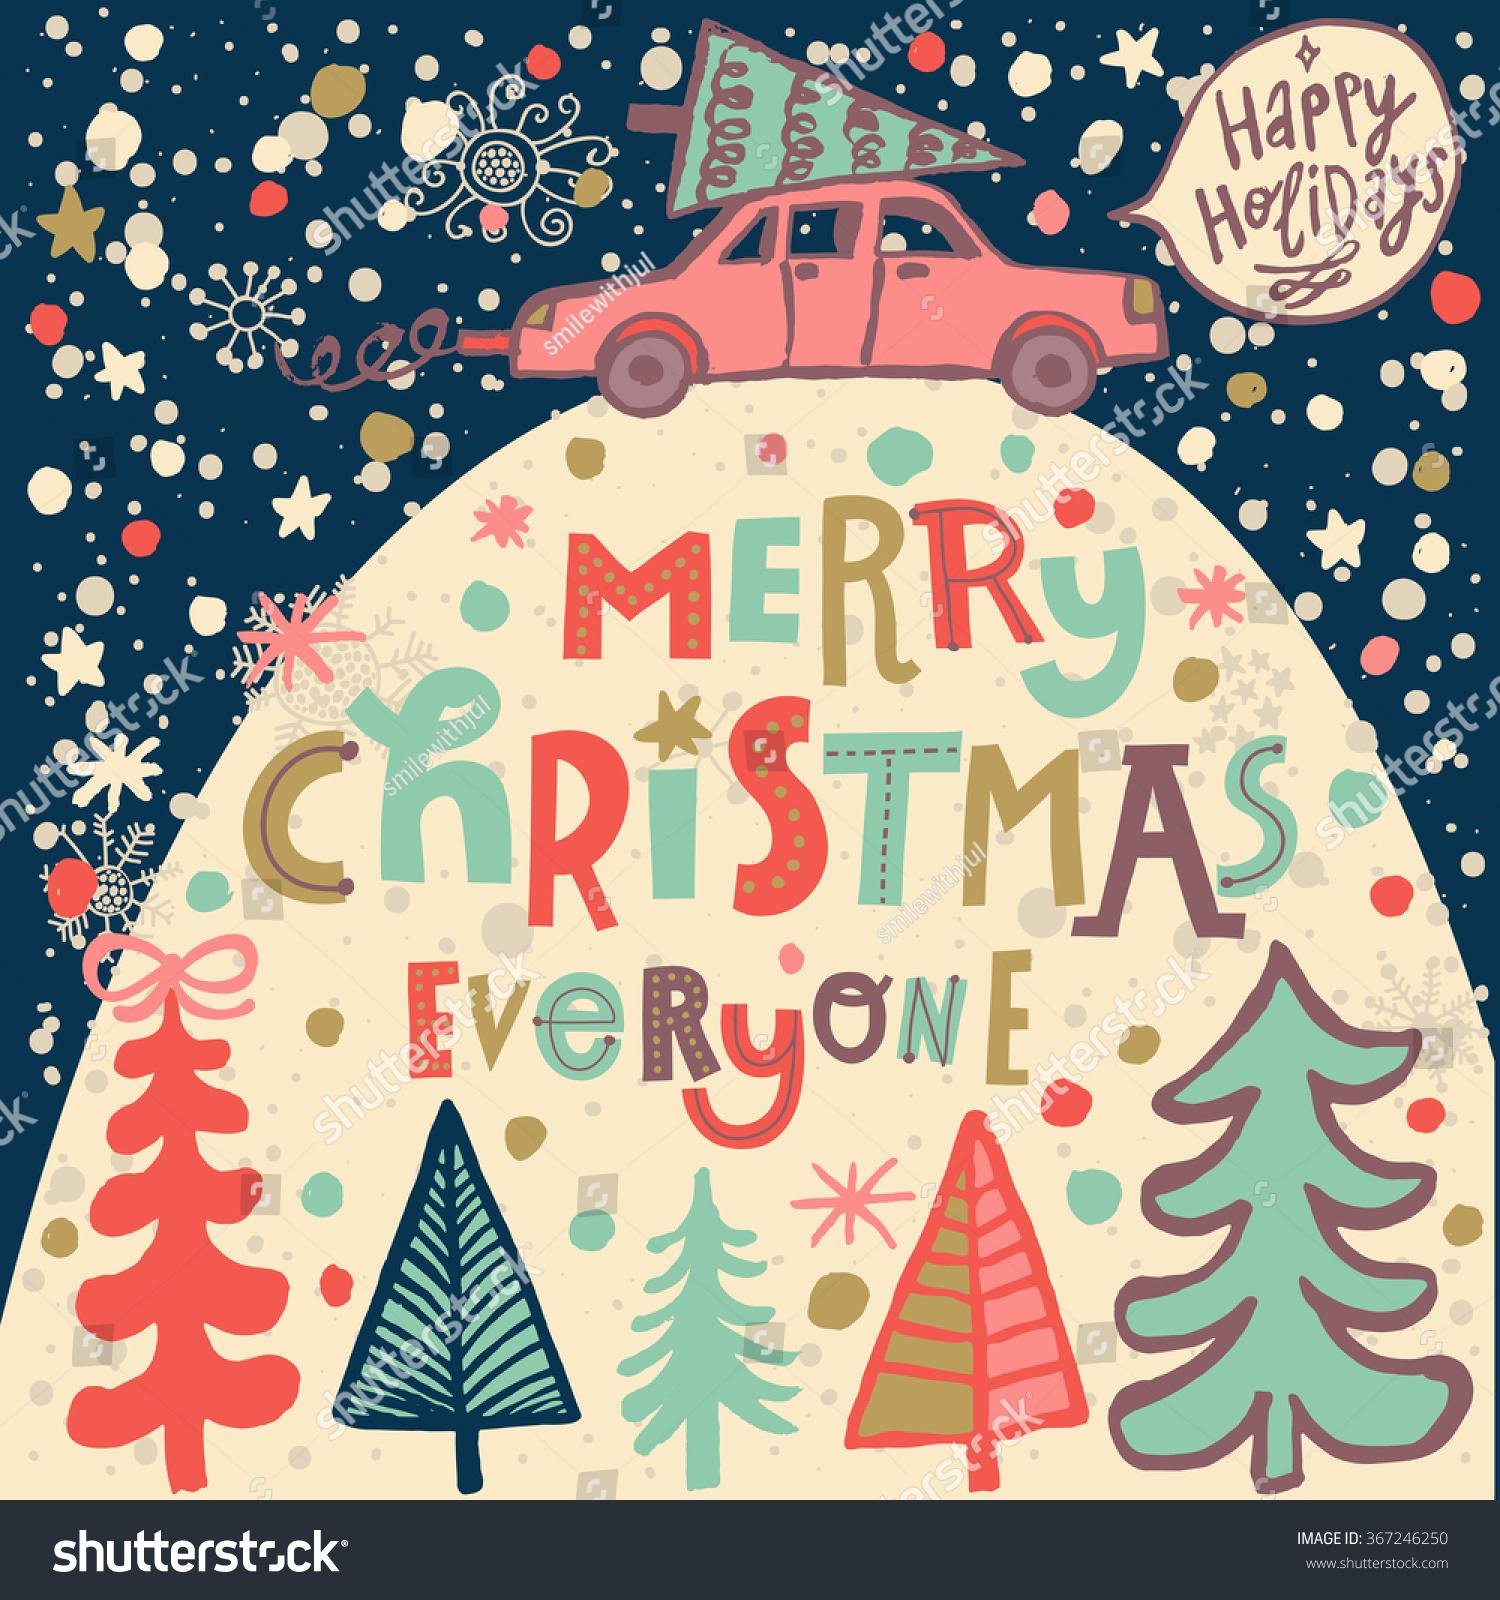 Merry Christmas Everyone Concept Card Bright Stock Vector (Royalty ...